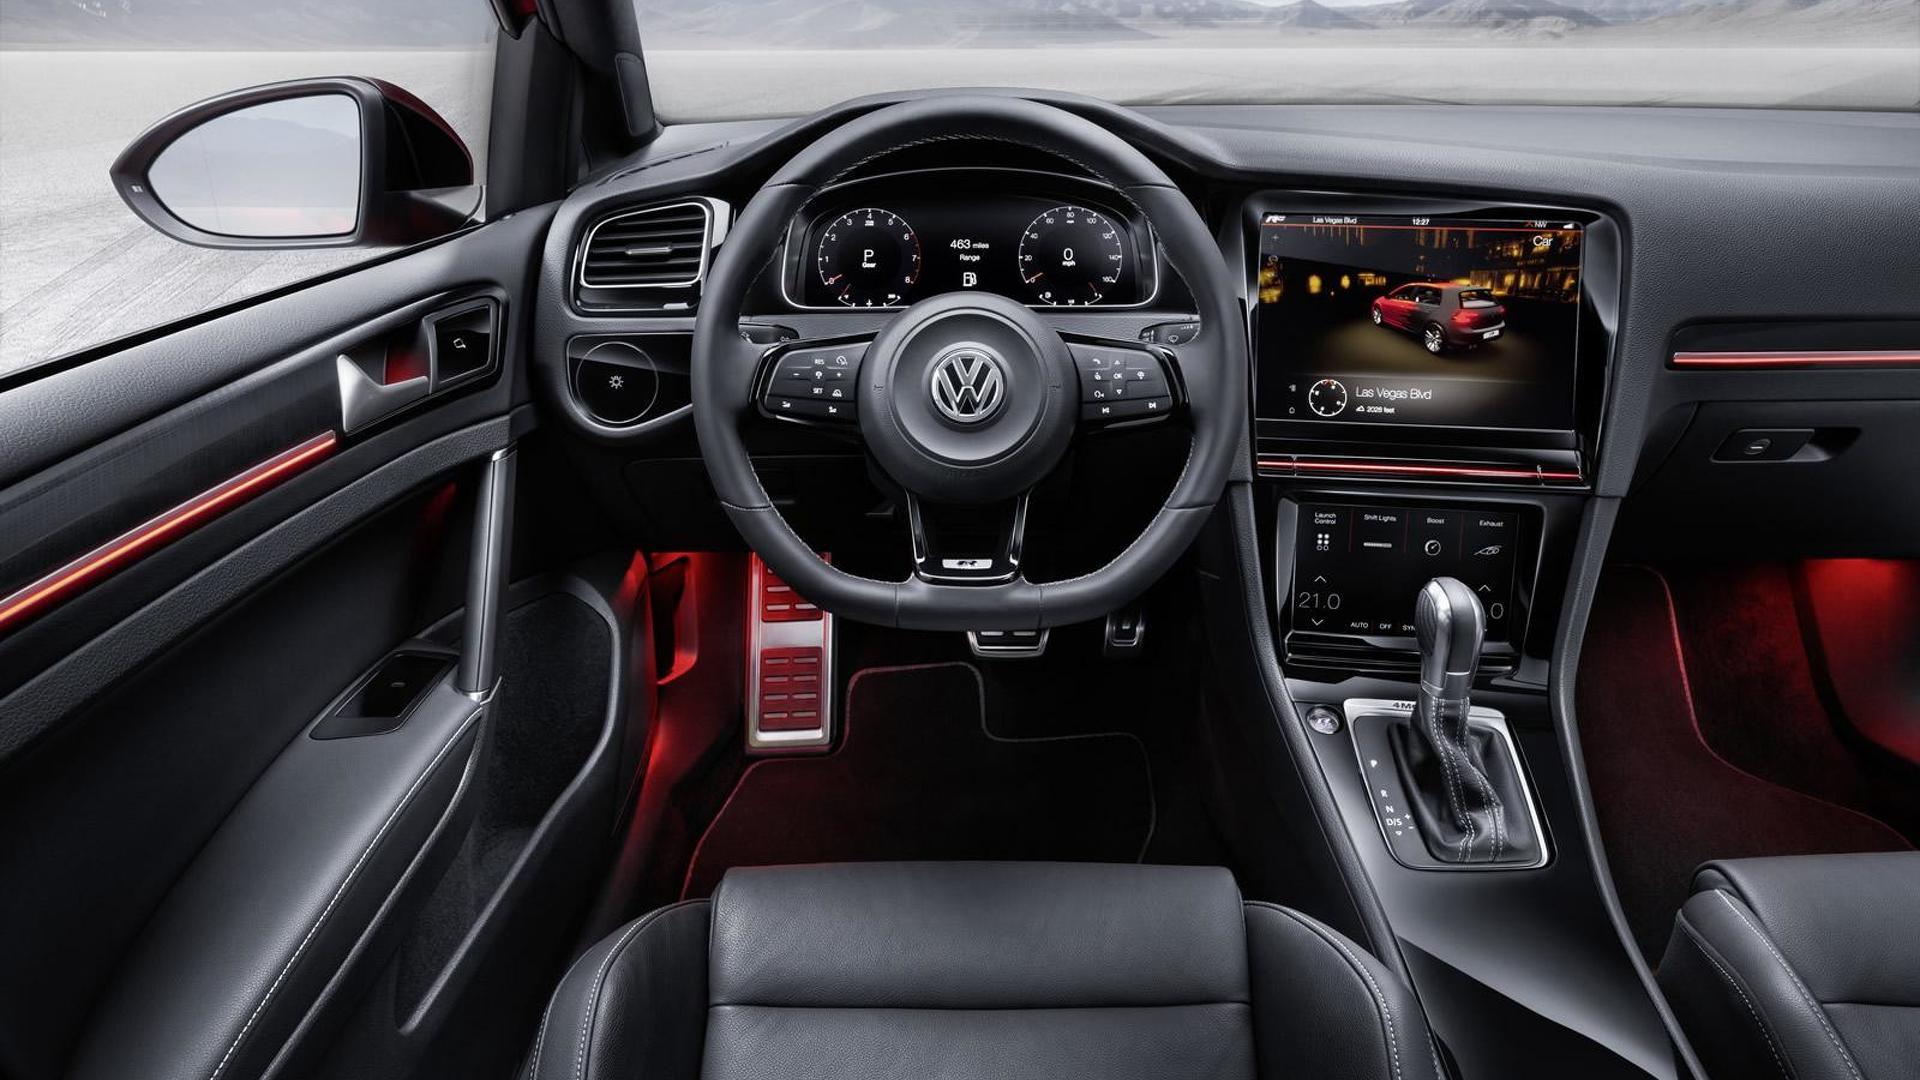 Управление на сенсорных экранах Volkswagen Golf R Touch